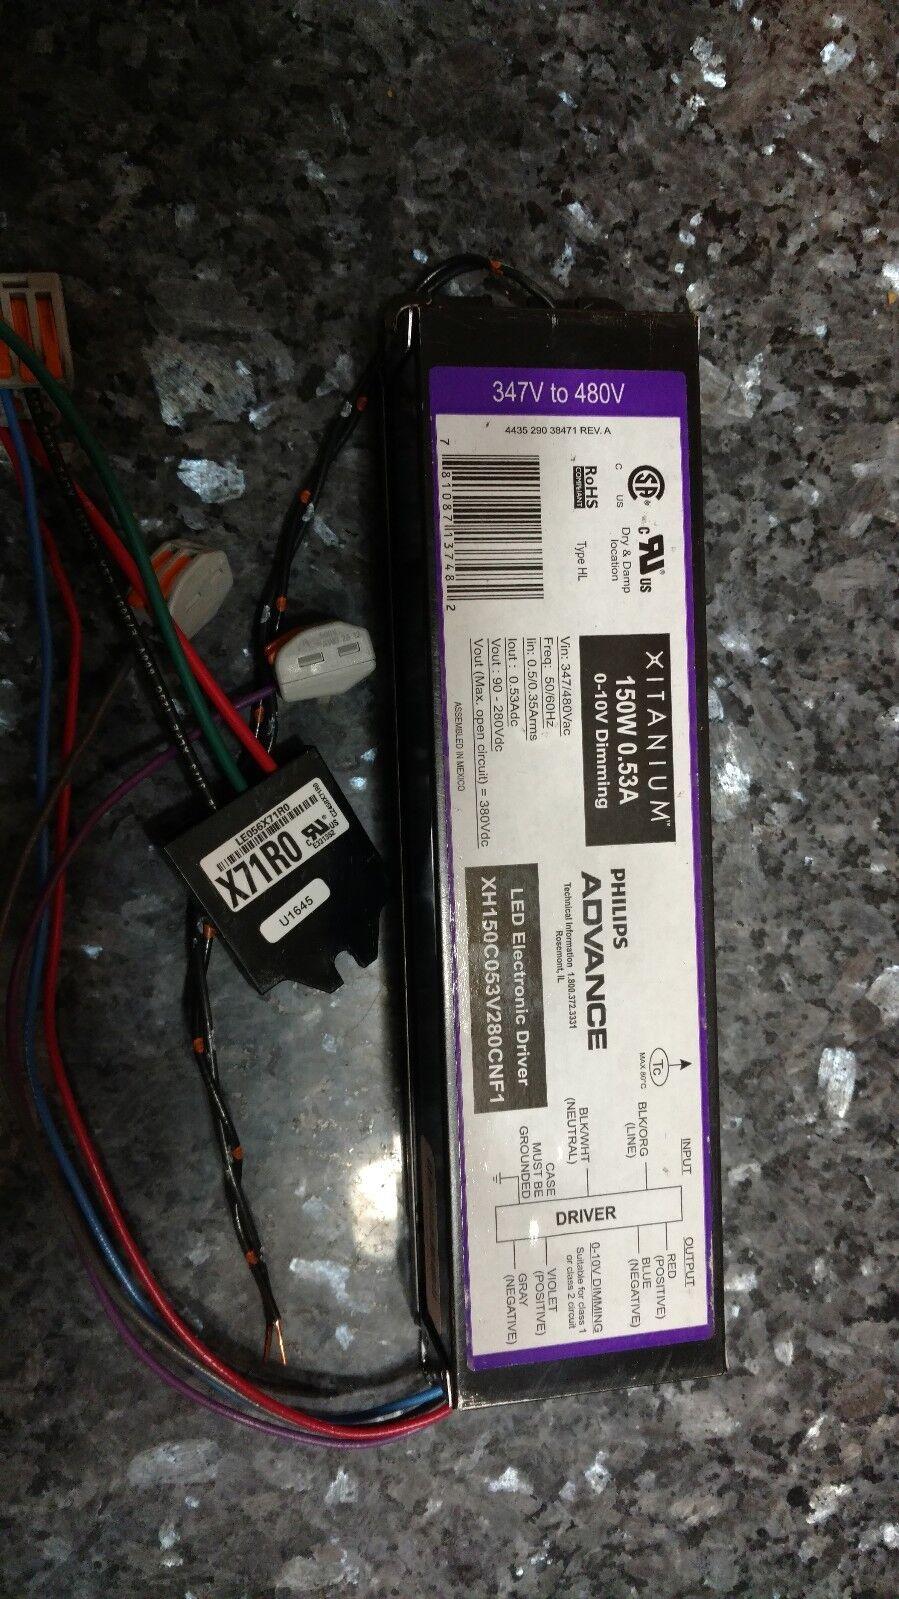 120-277VAC 150W Philips Advance LED Driver LED-INTA-0530C-280-DO